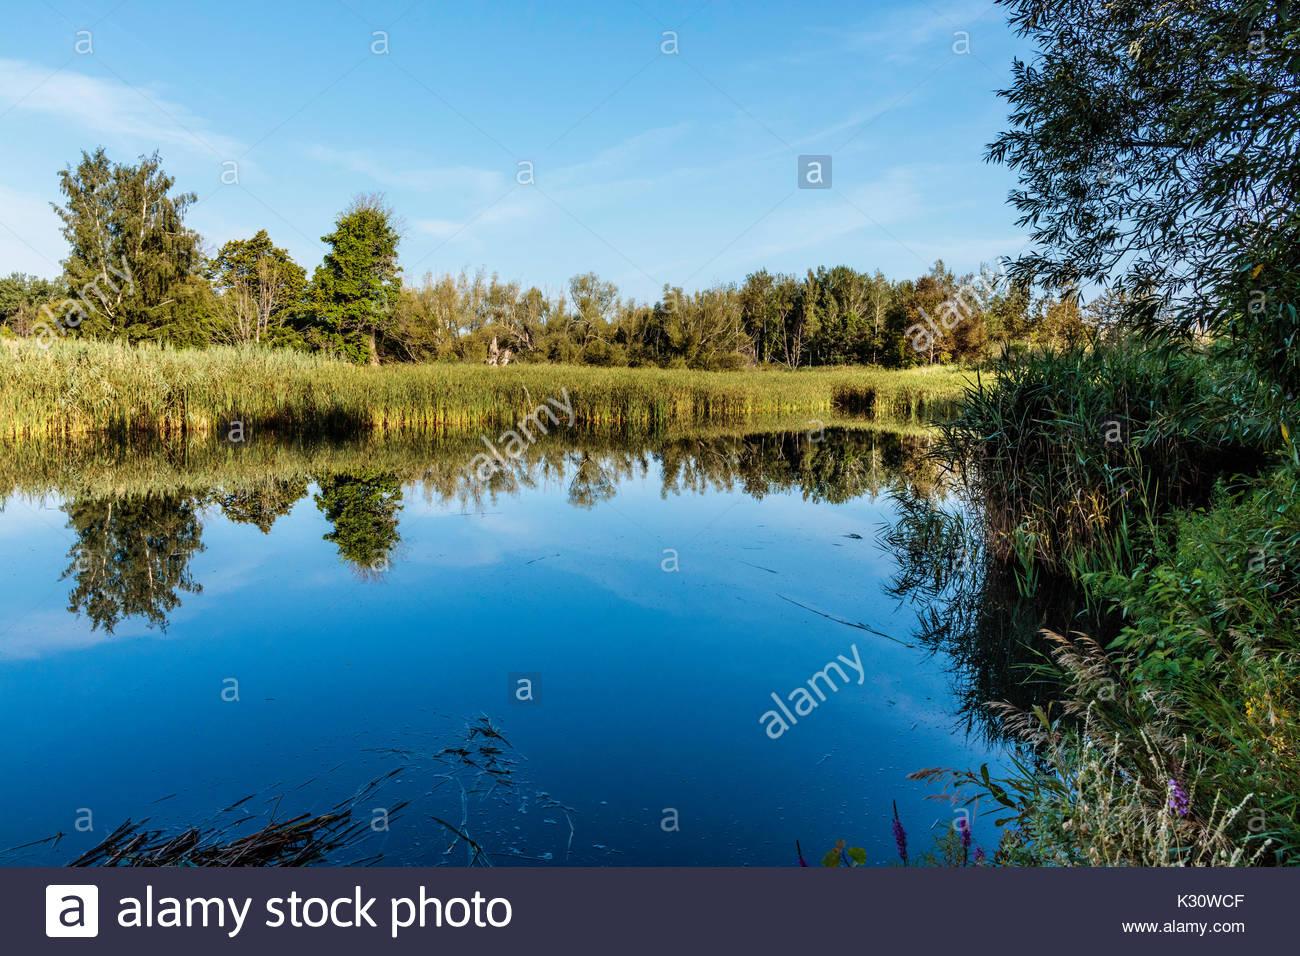 reflections in stormwater retention pond sedimentation pond environment marsh Eastpoint Park Toronto Ontario Canada - Stock Image